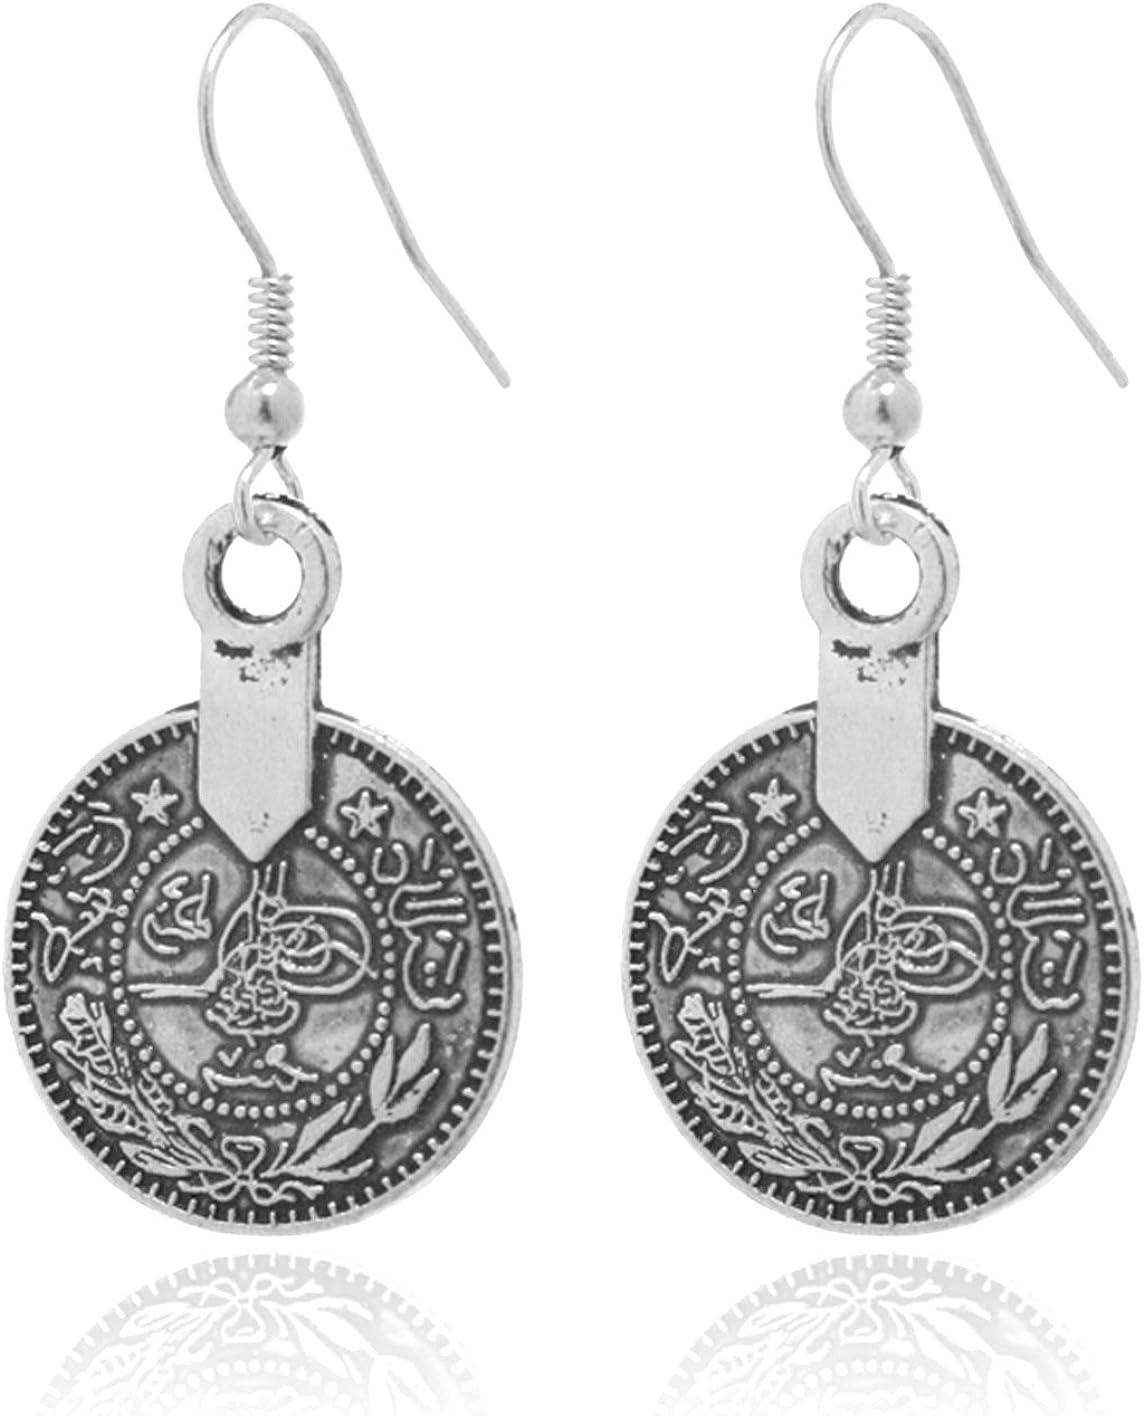 2LIVEfor Taler - Pendientes redondos de monedas étnicas, estilo bohemio, vintage, retro, largos, colgantes, estilo antiguo, gotas